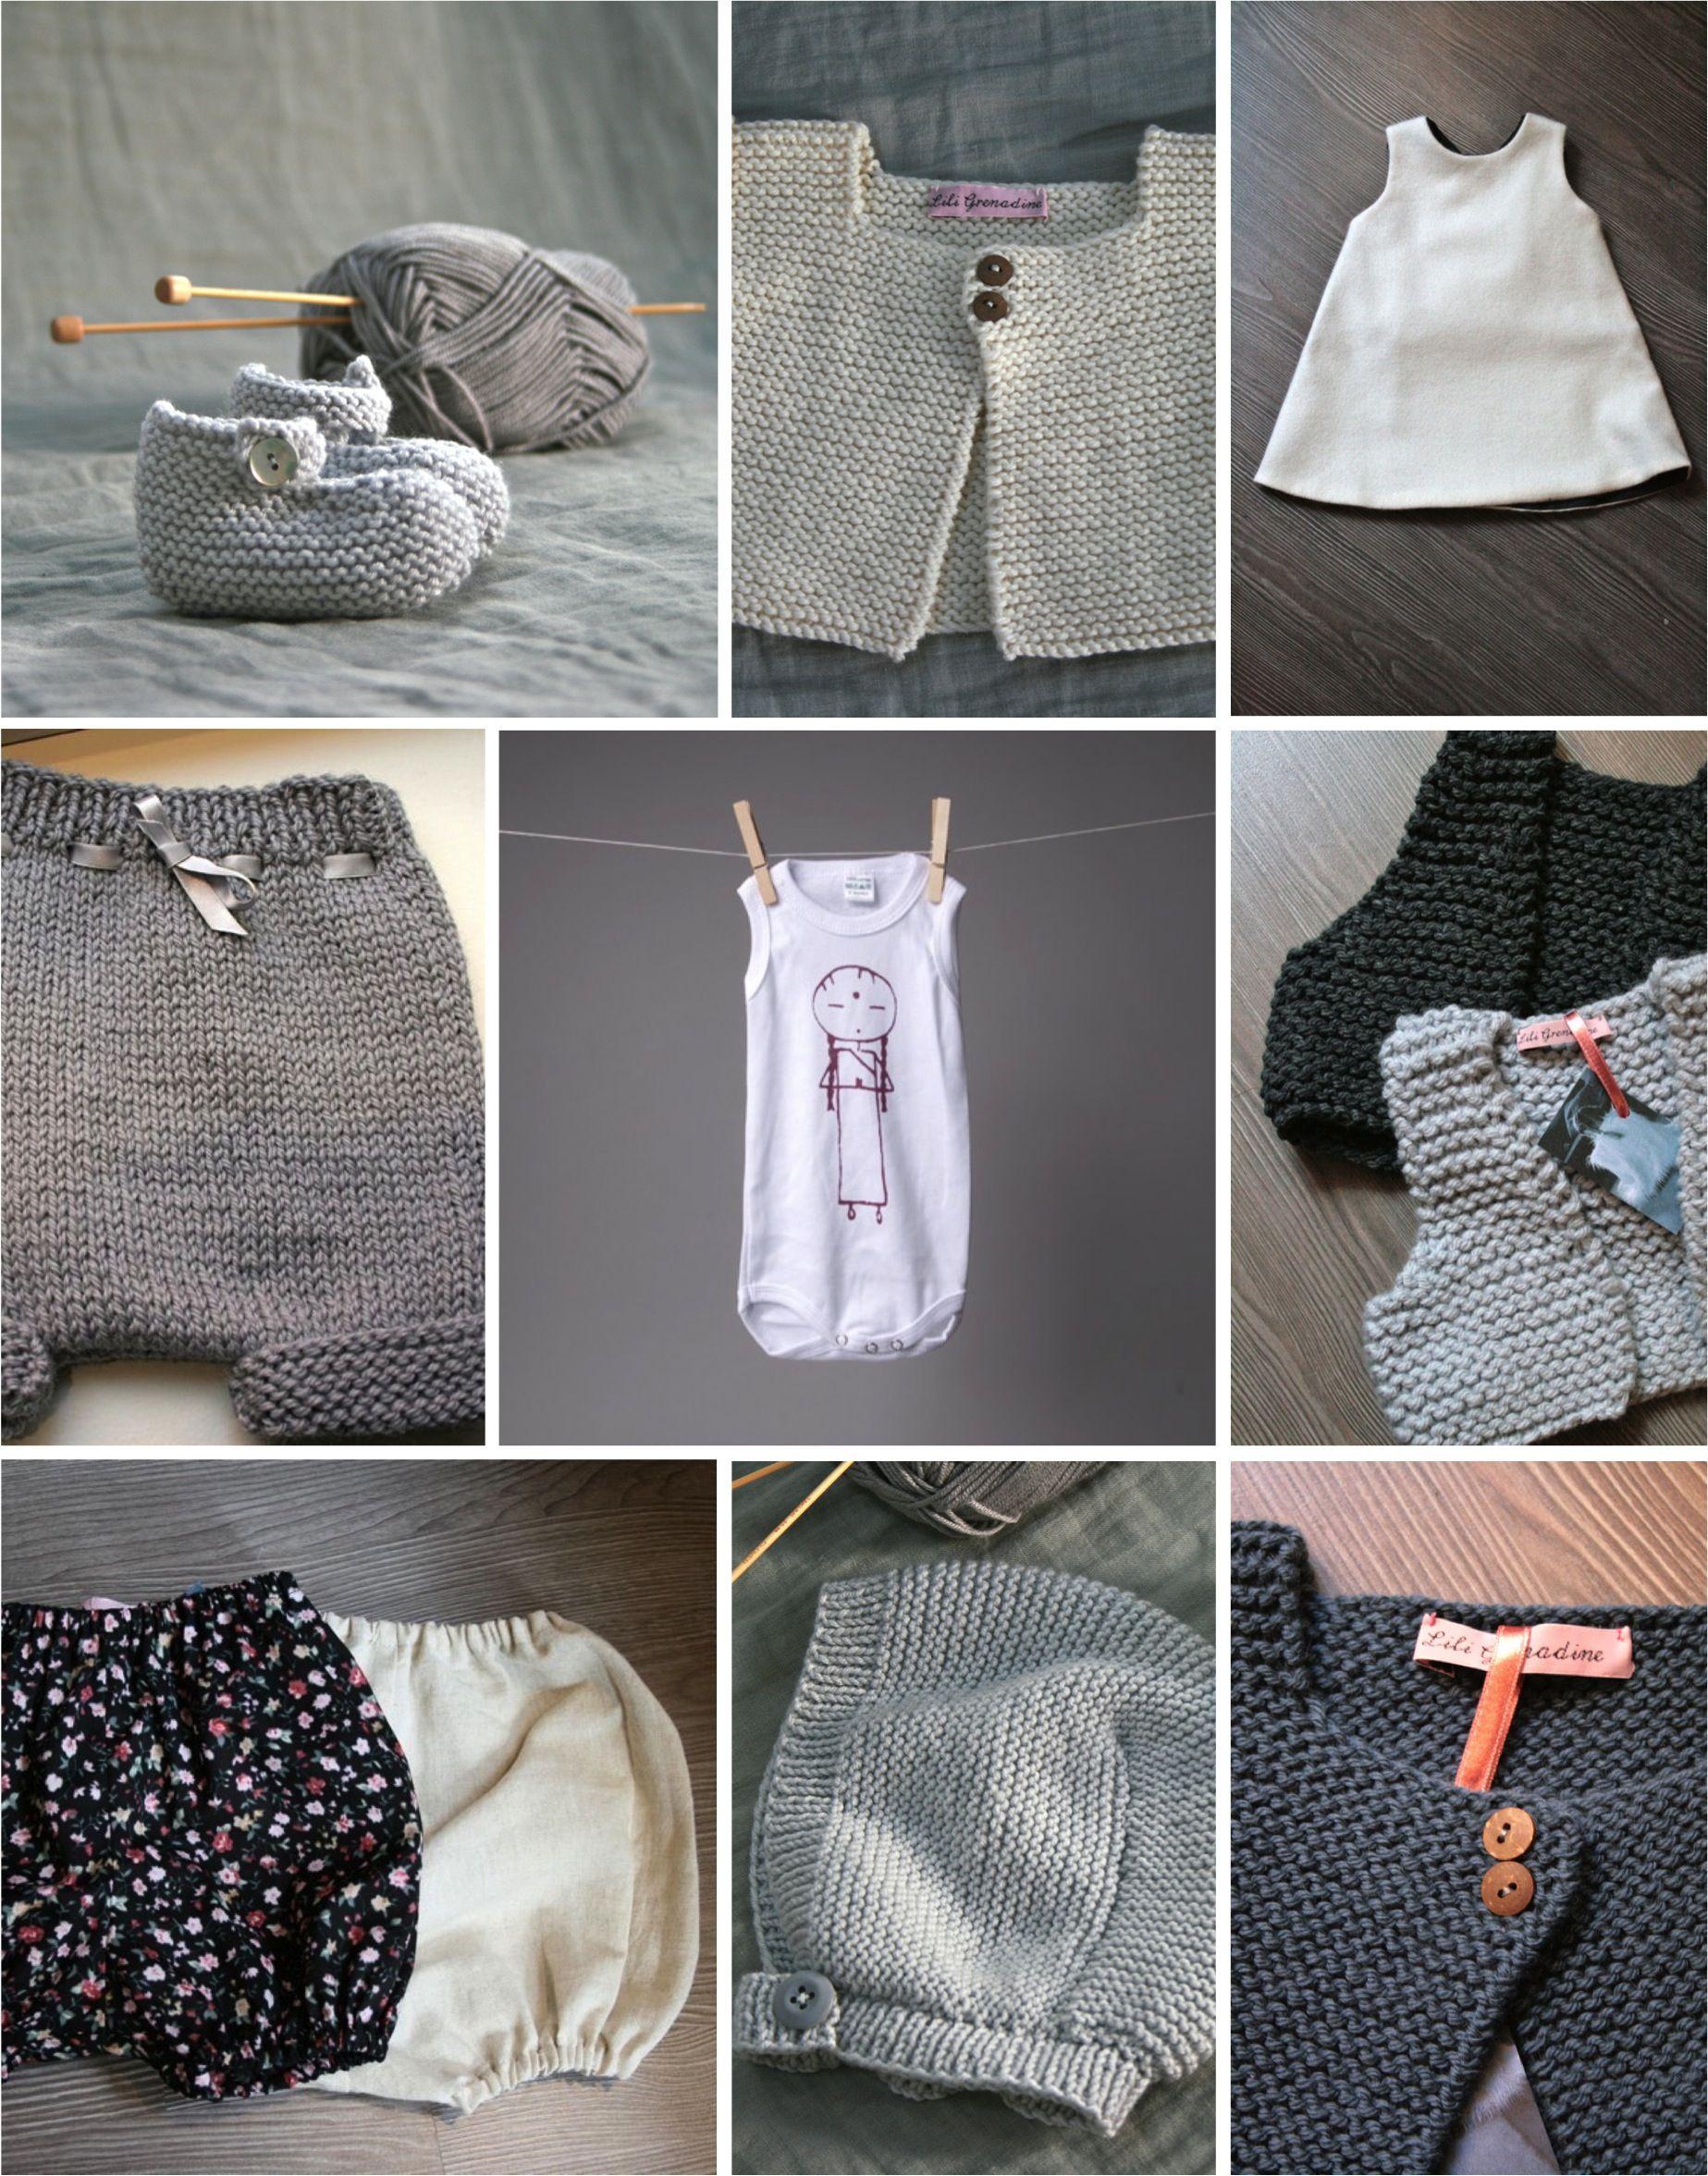 lili_grenadine_baby_knits.jpg 1.847×2.353 piksel